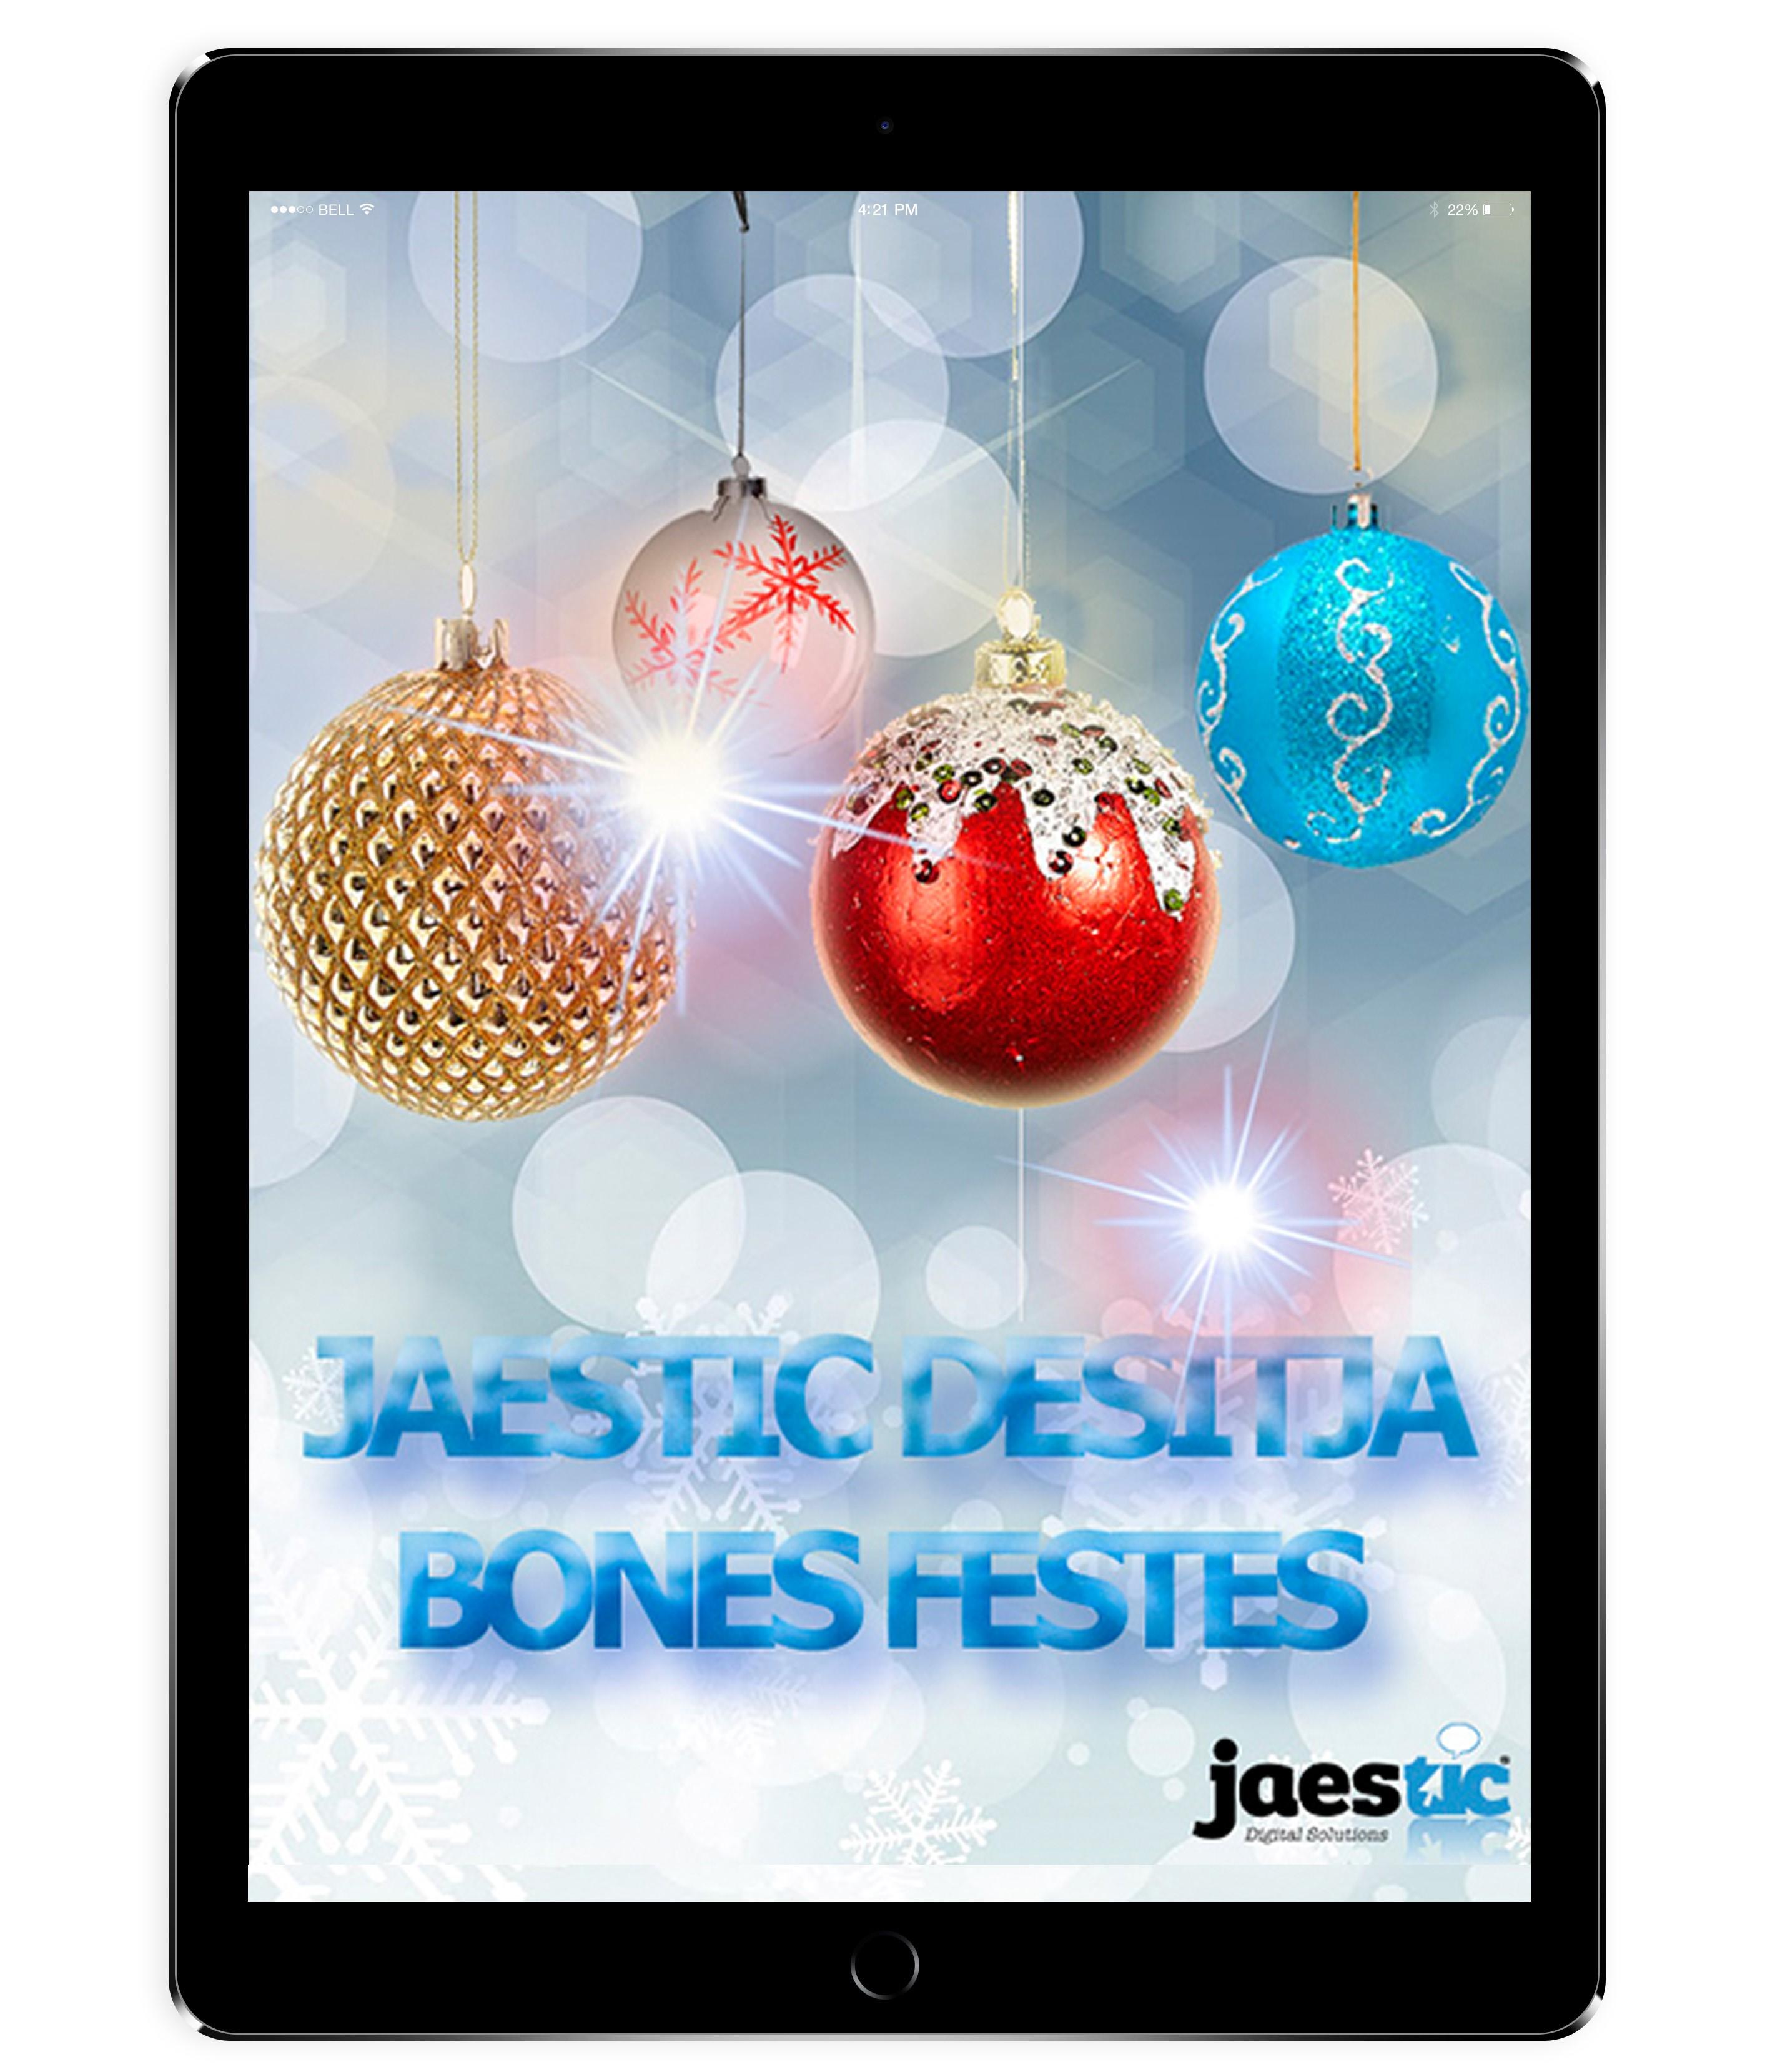 Jaestic te desea Felices Fiestas!!